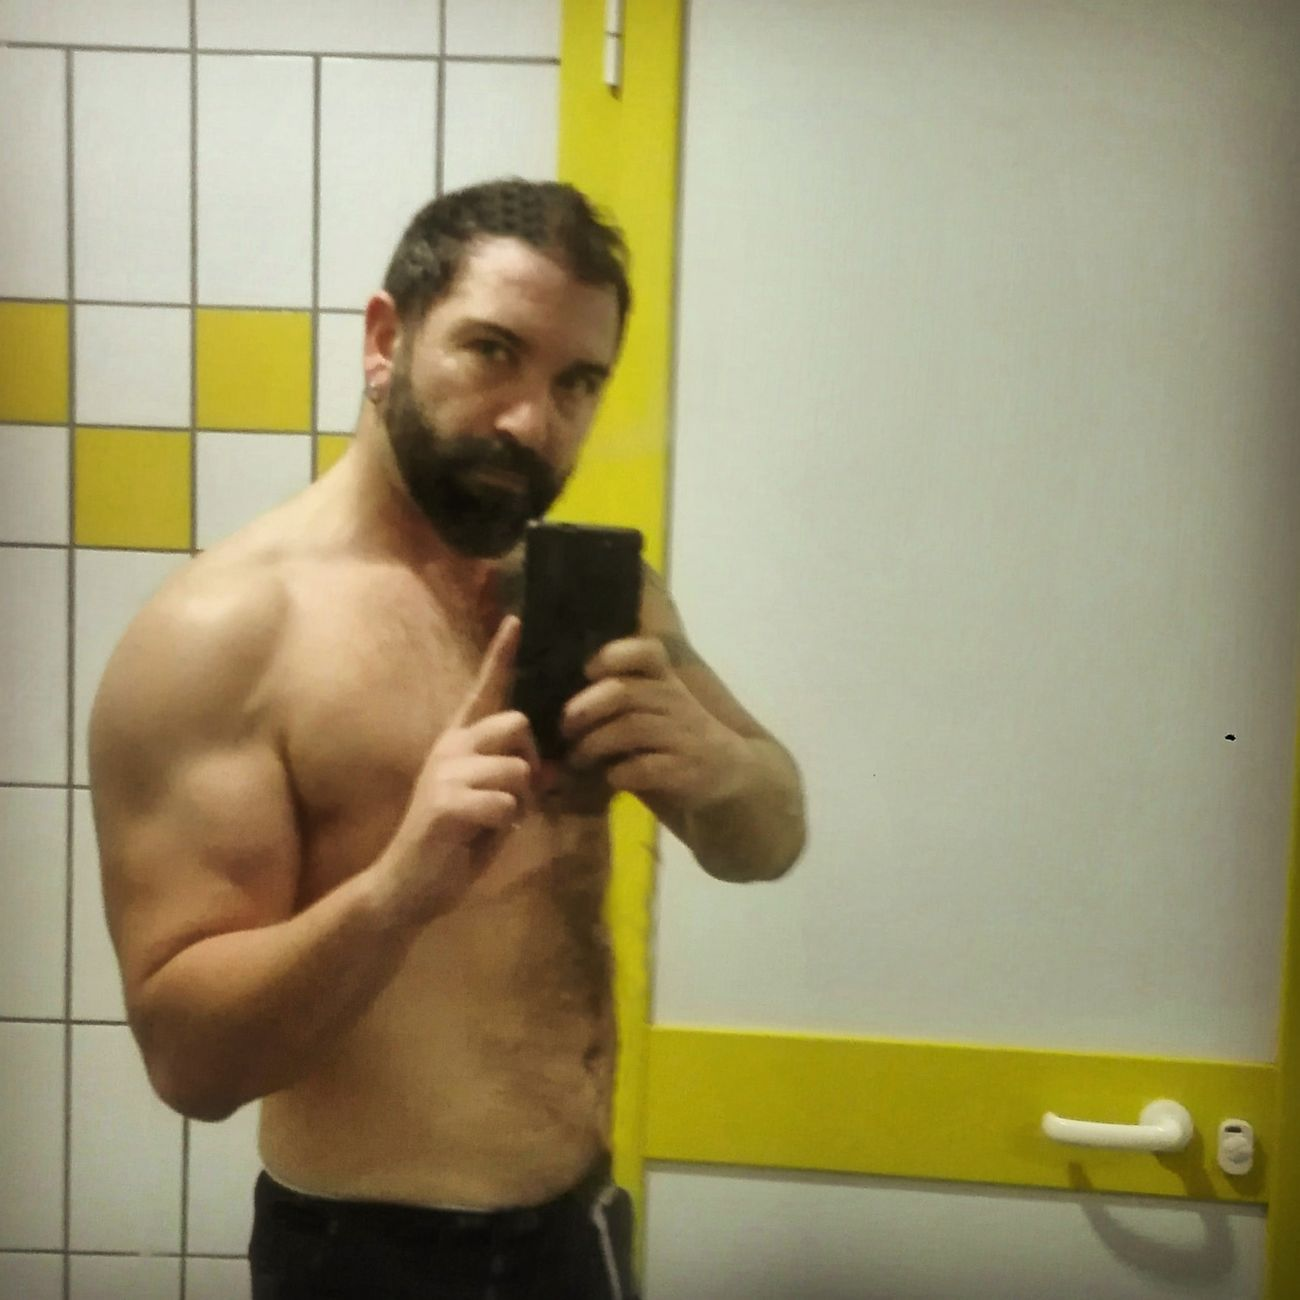 Me Selfie Time Enjoying Life Self Selfie ♥ That's Me Beardporn Sexyselfie Gymselfie Gym! Beard Beardlife Beardstyle Beardman